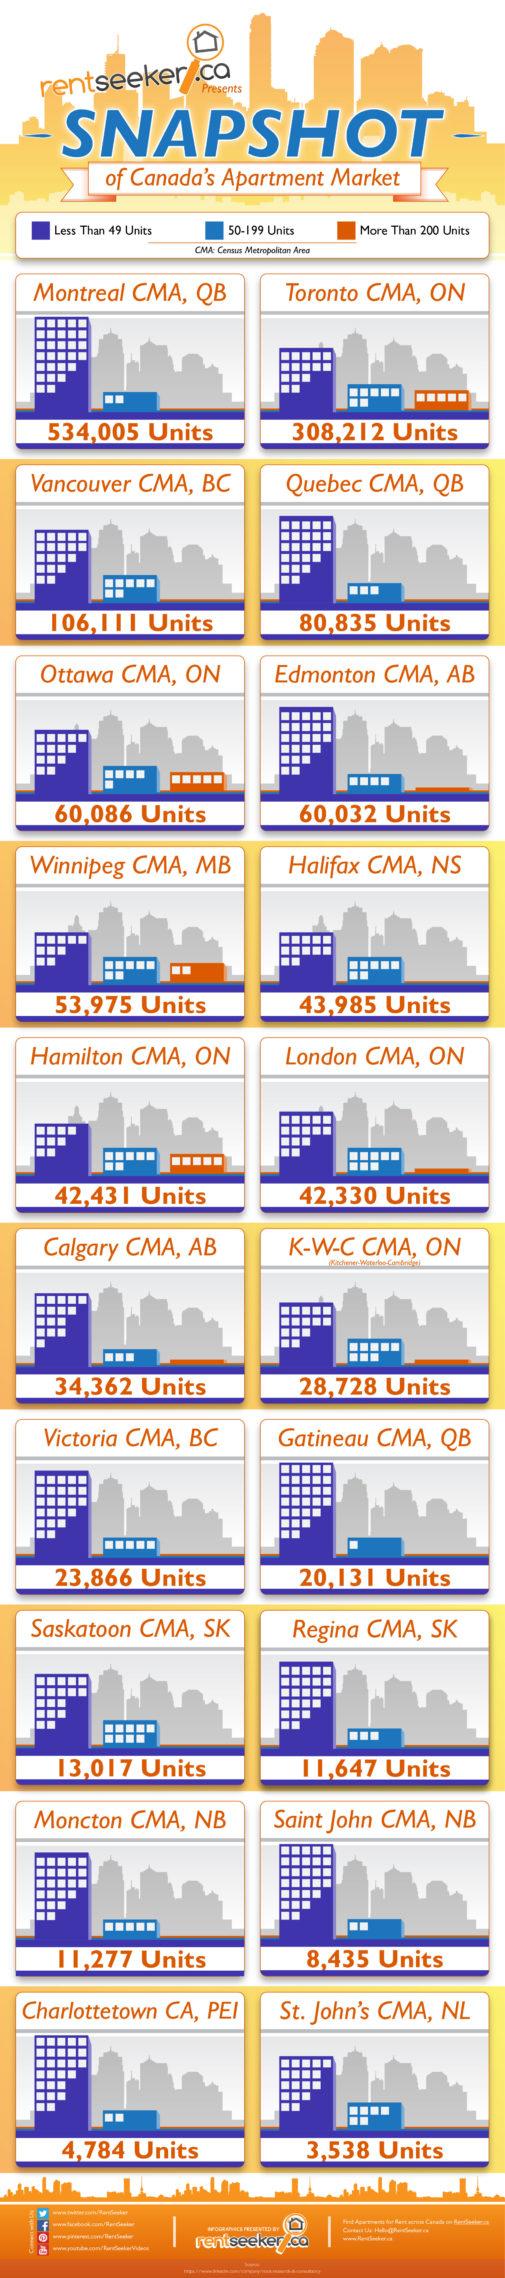 A Snapshot of Canada's Apartment Market INFOGRAPH -RentSeeker.ca